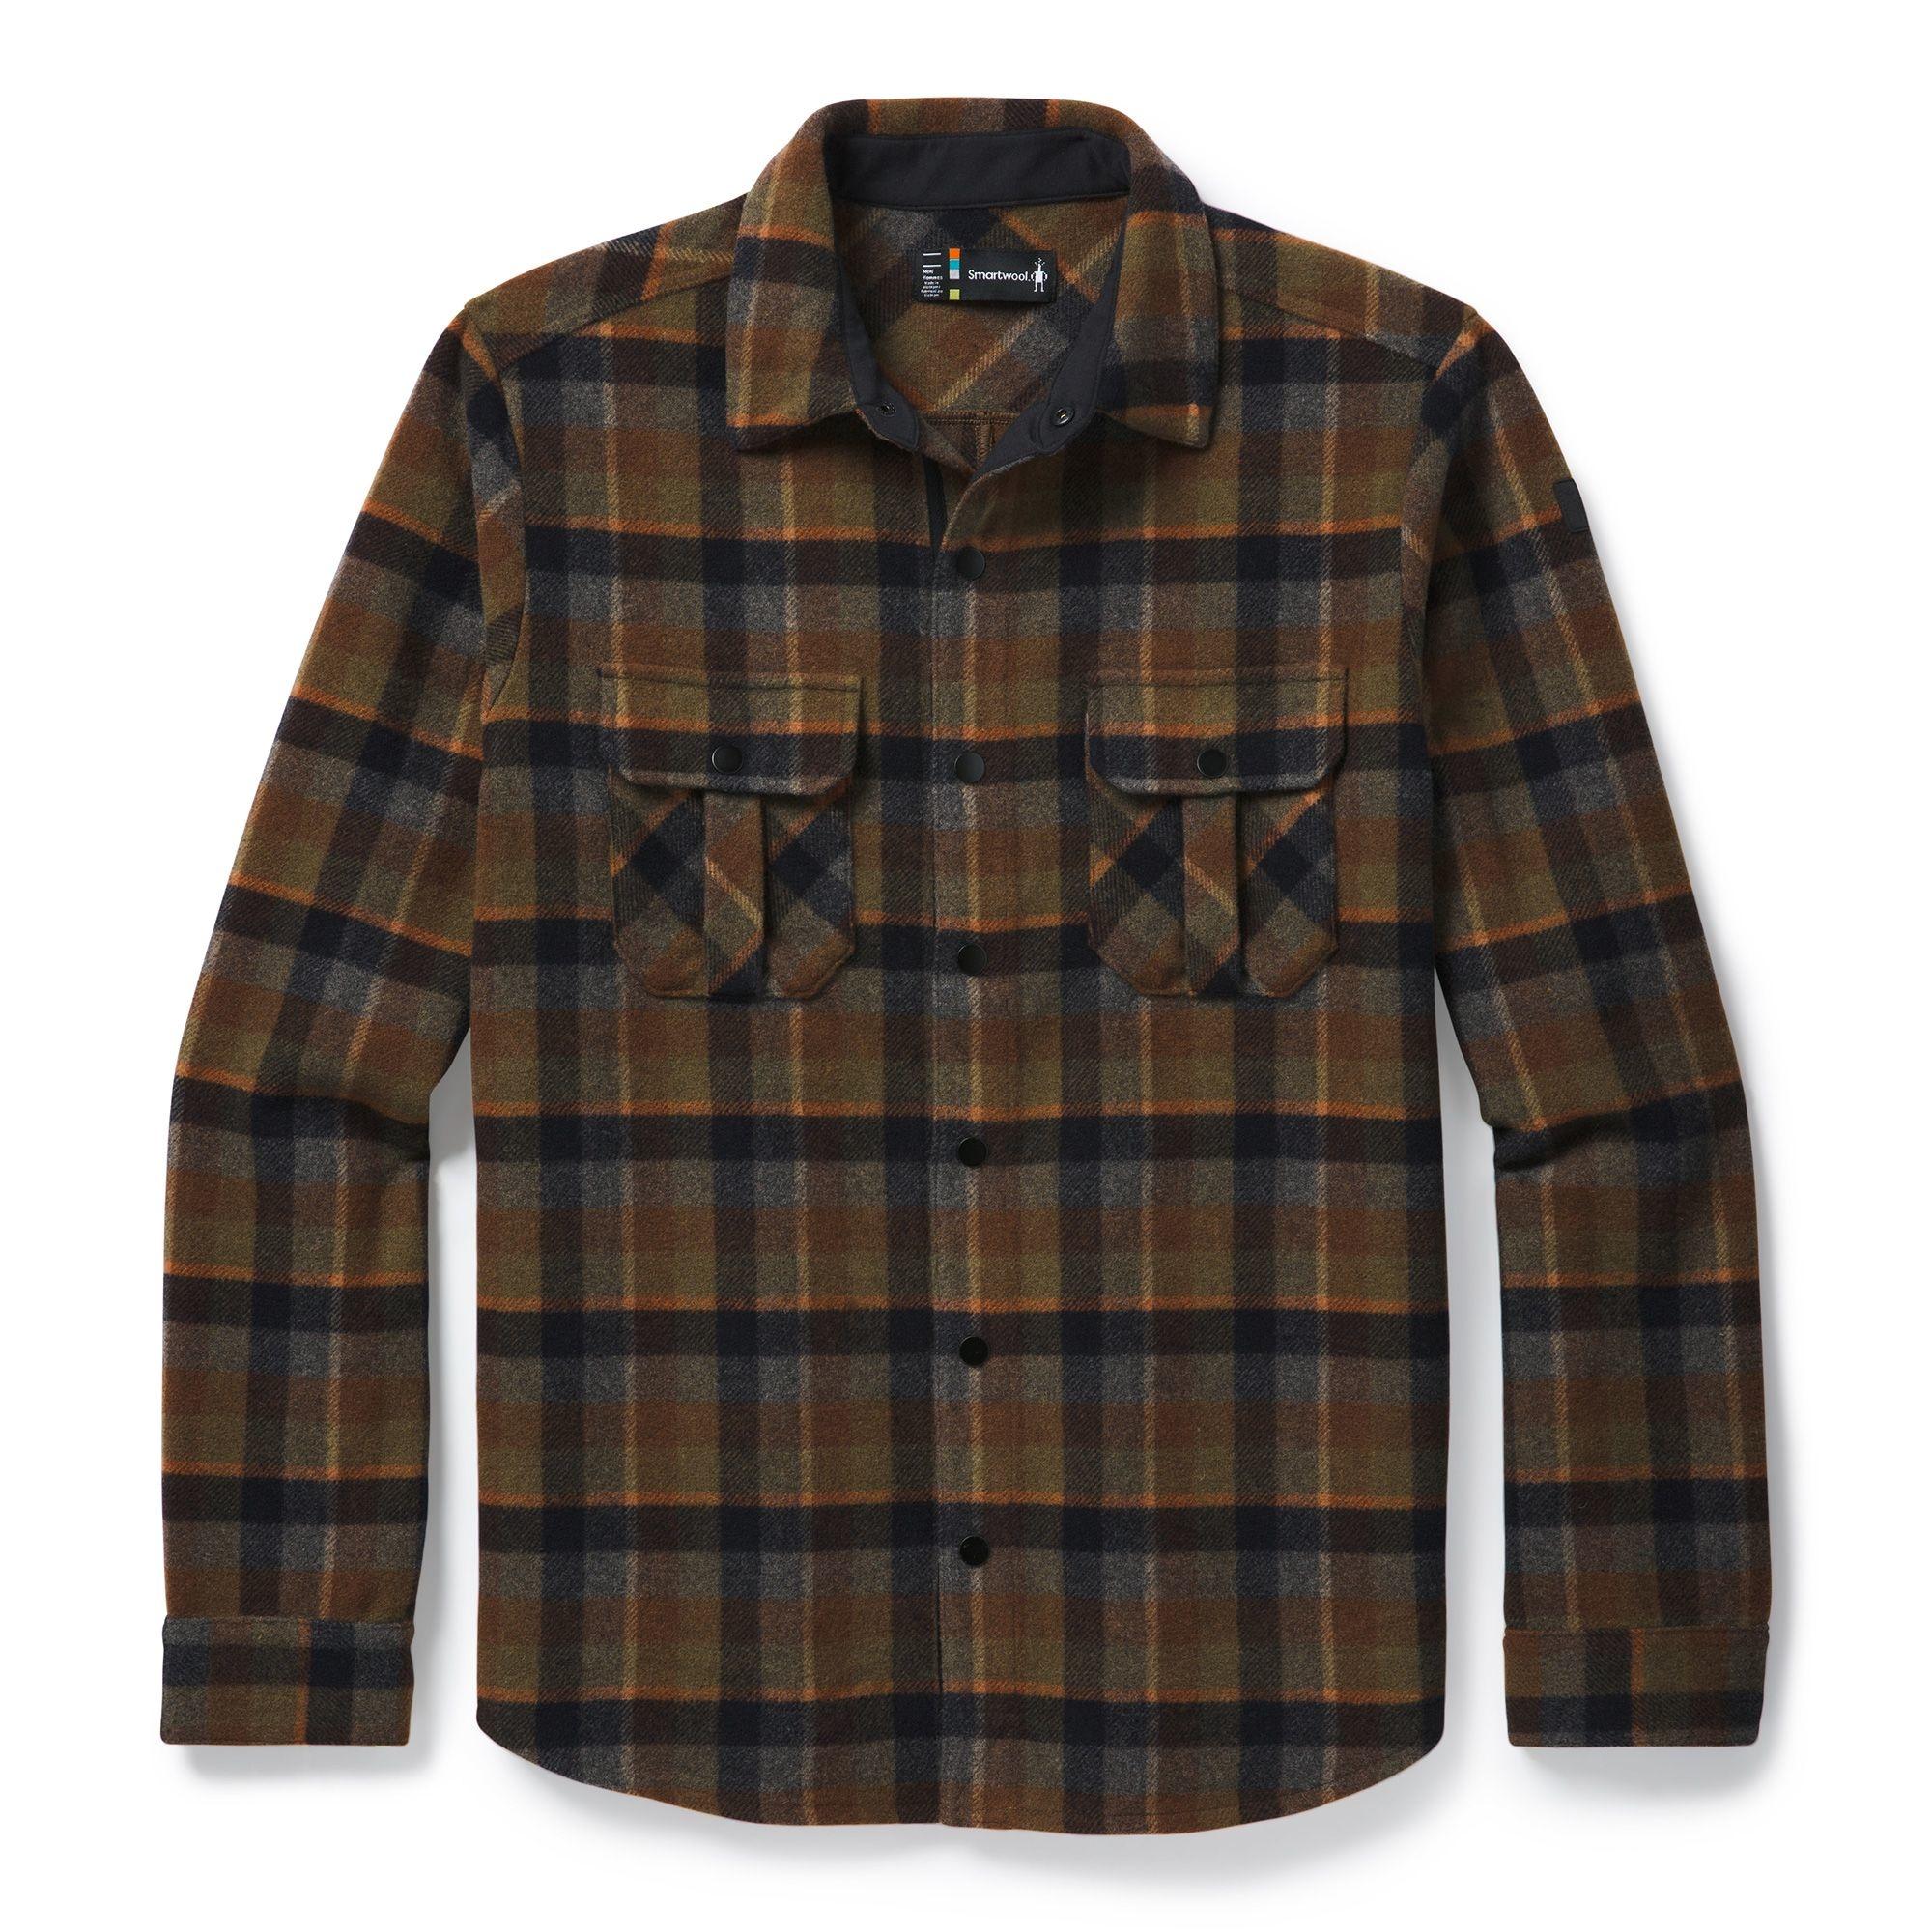 Anchor Line Shirt Jacket, OLIVE PLAID